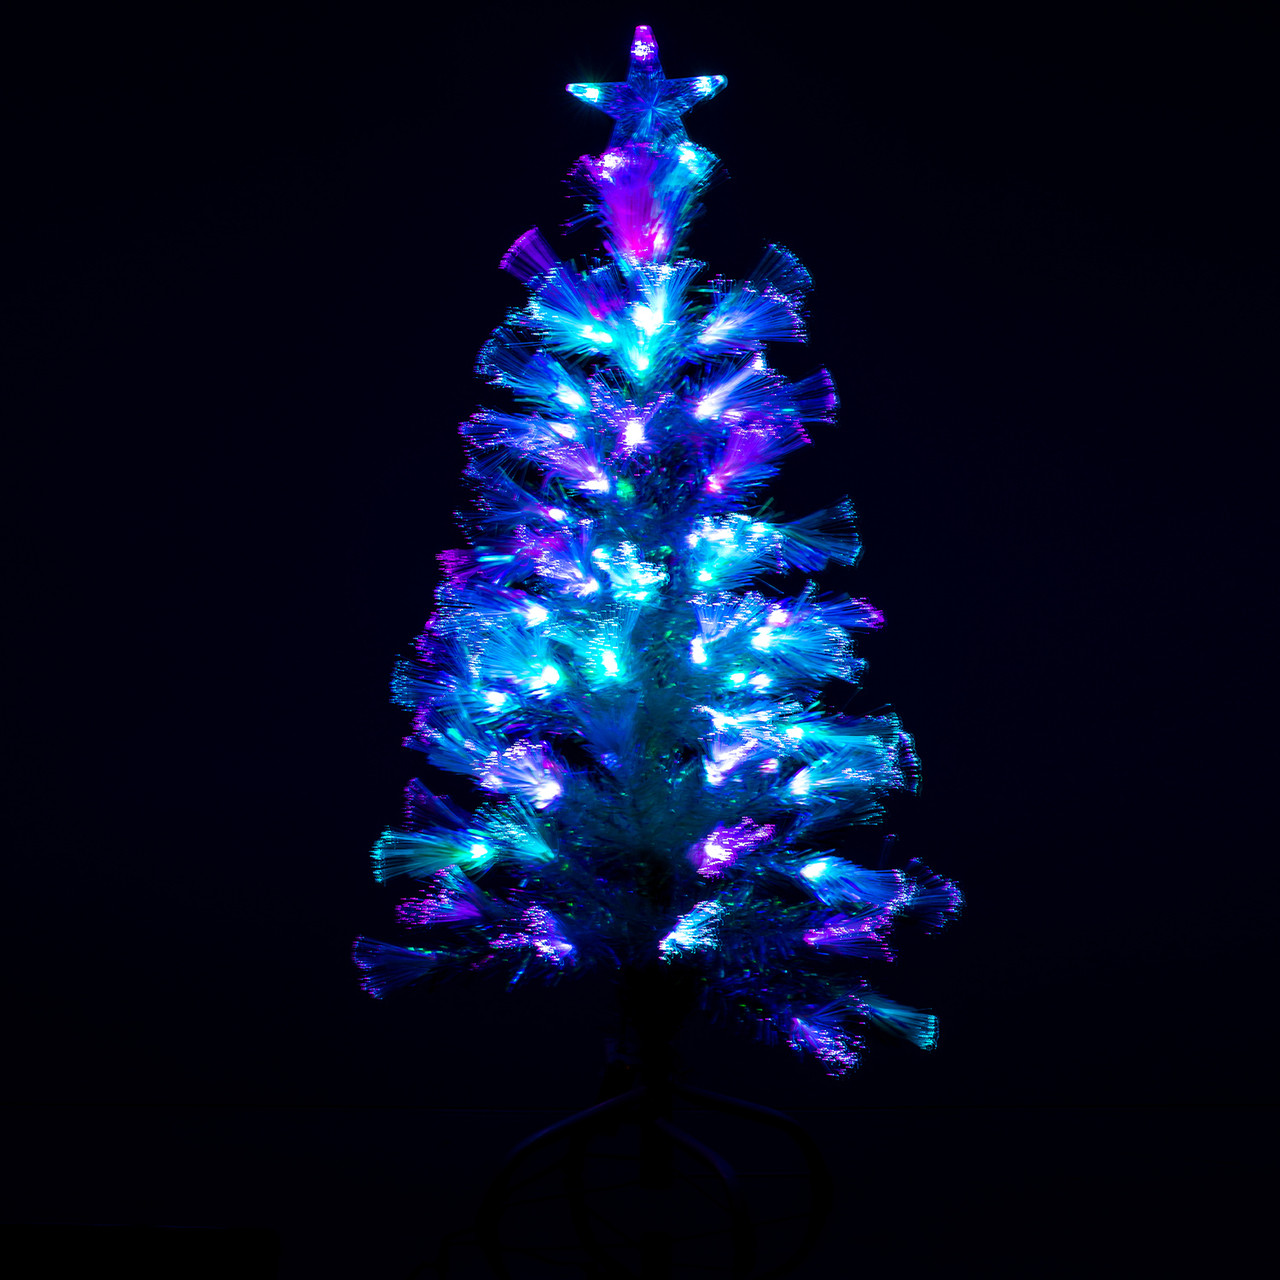 reputable site 67859 1fd80 Fibre Optic Christmas Tree with Light Show